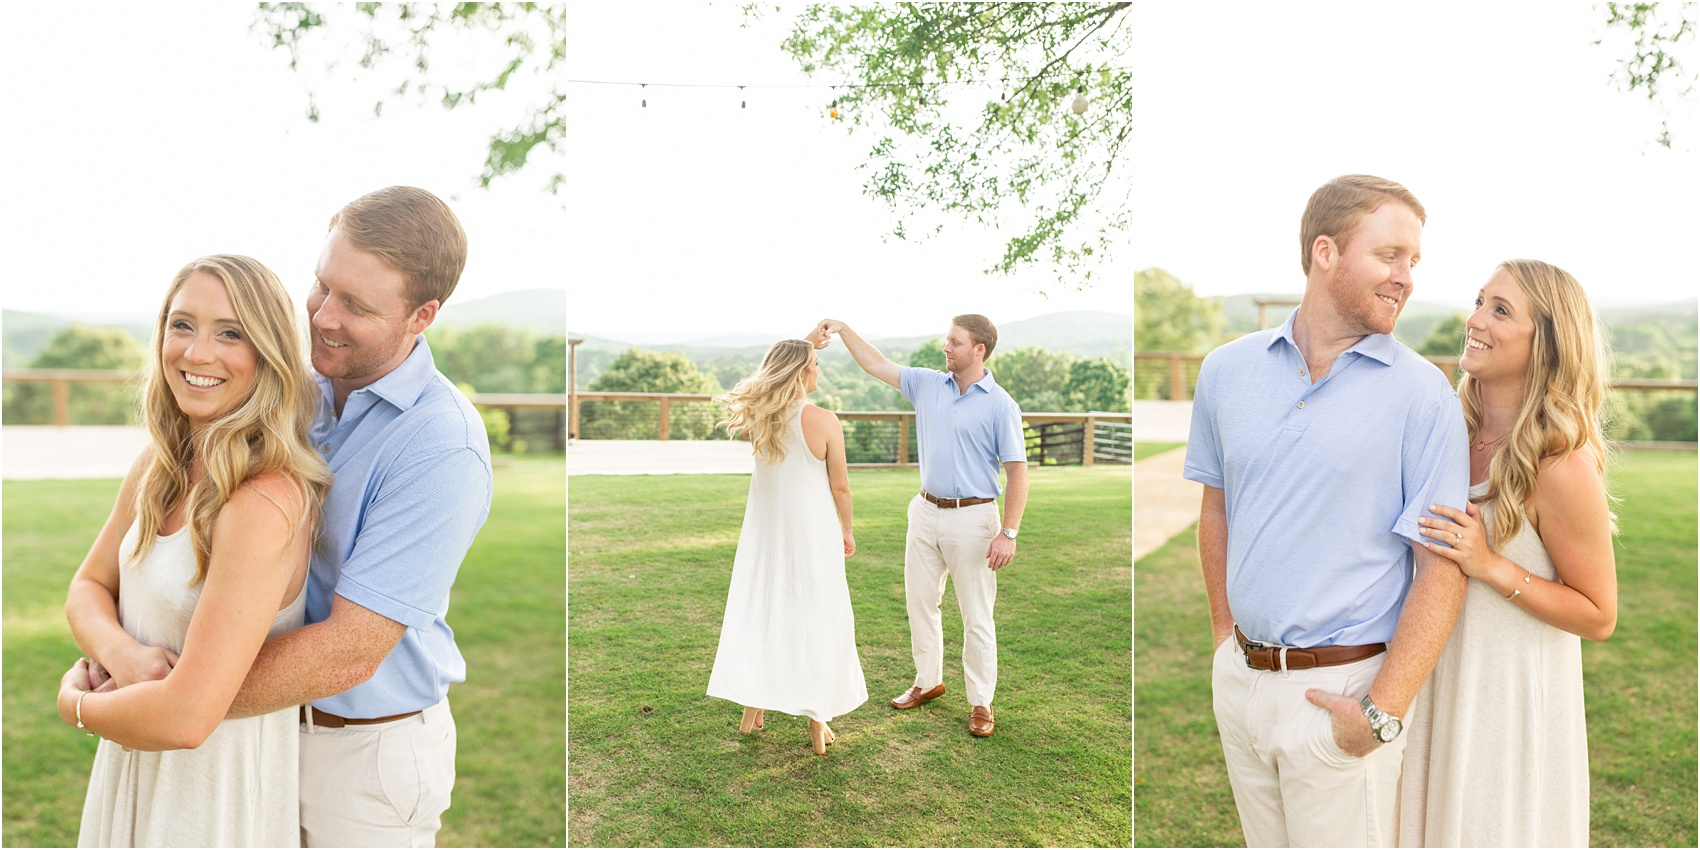 Savannah Eve Photography LLC- Henry-Caffee Engagements-4.jpg